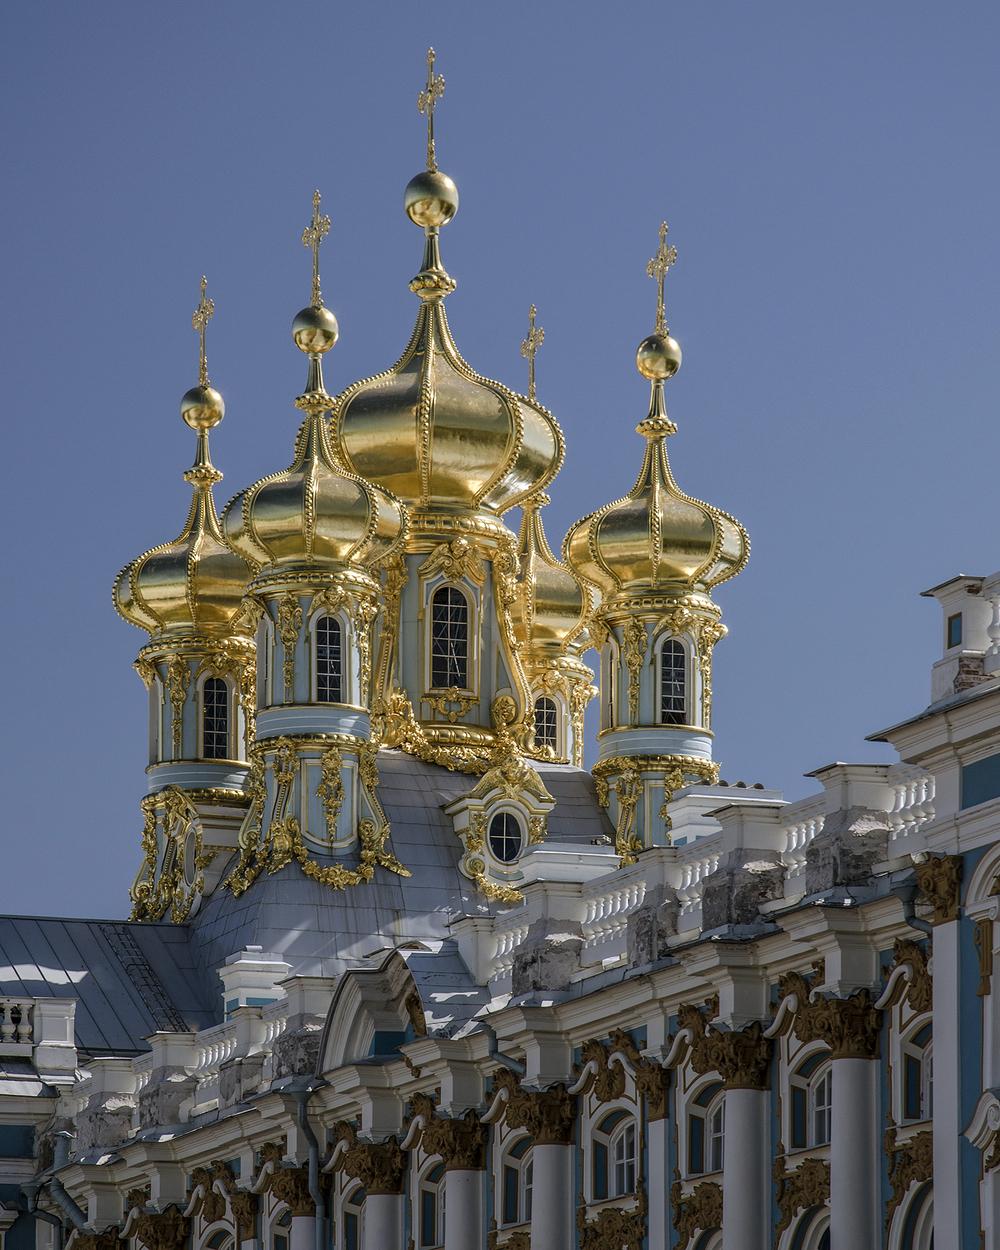 S. Pietroburgo-palazzo di Caterina-8072.jpg